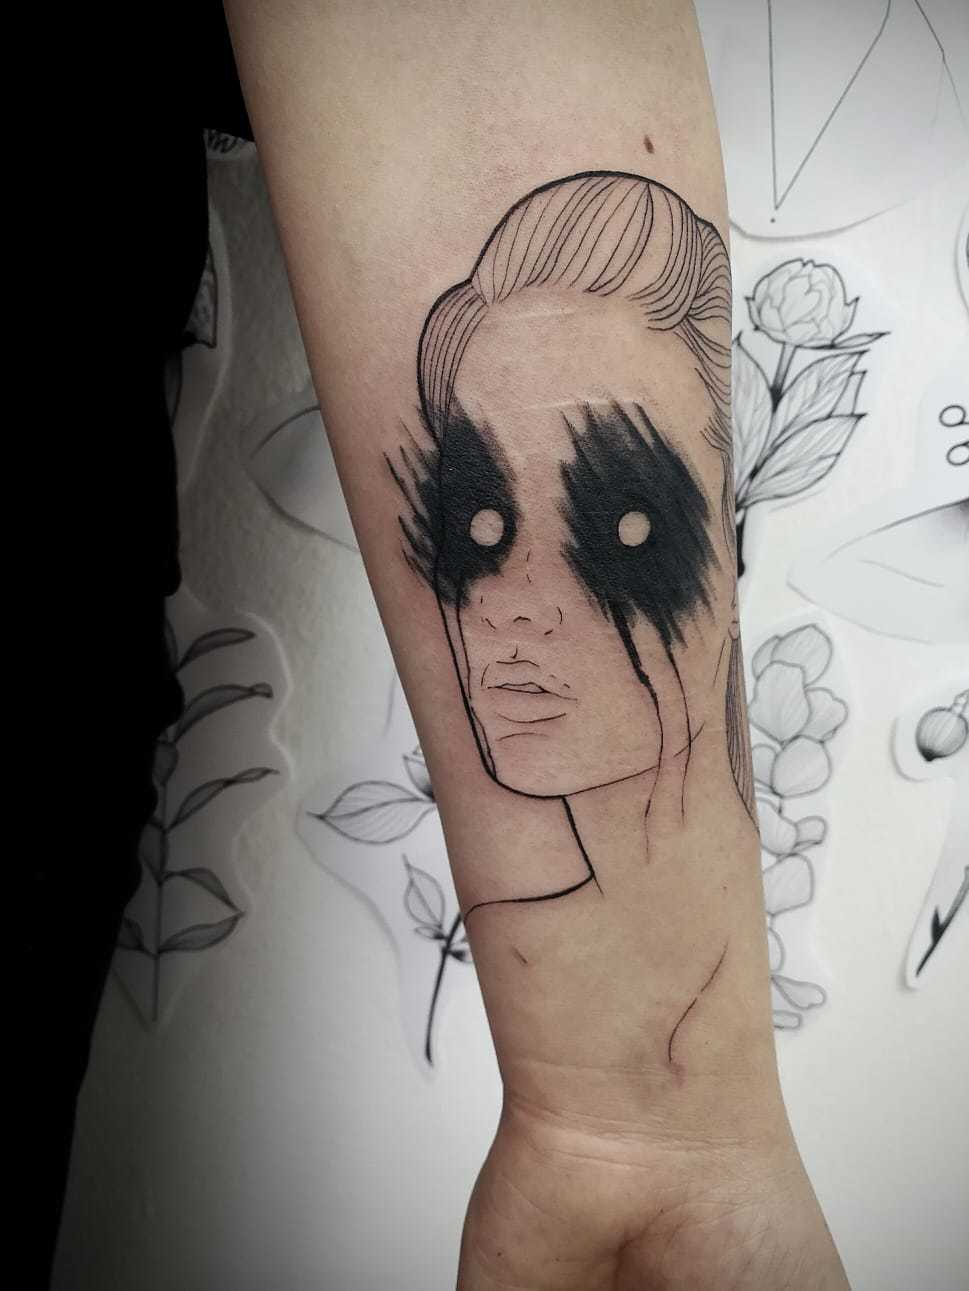 Ligera-ink-tattoo-milano-tatuaggi-milano-migliori-tatuatori-milano-tatuaggi-blackwork-milano-tattoo-blackwork-milano-tattoo-avangarde-4